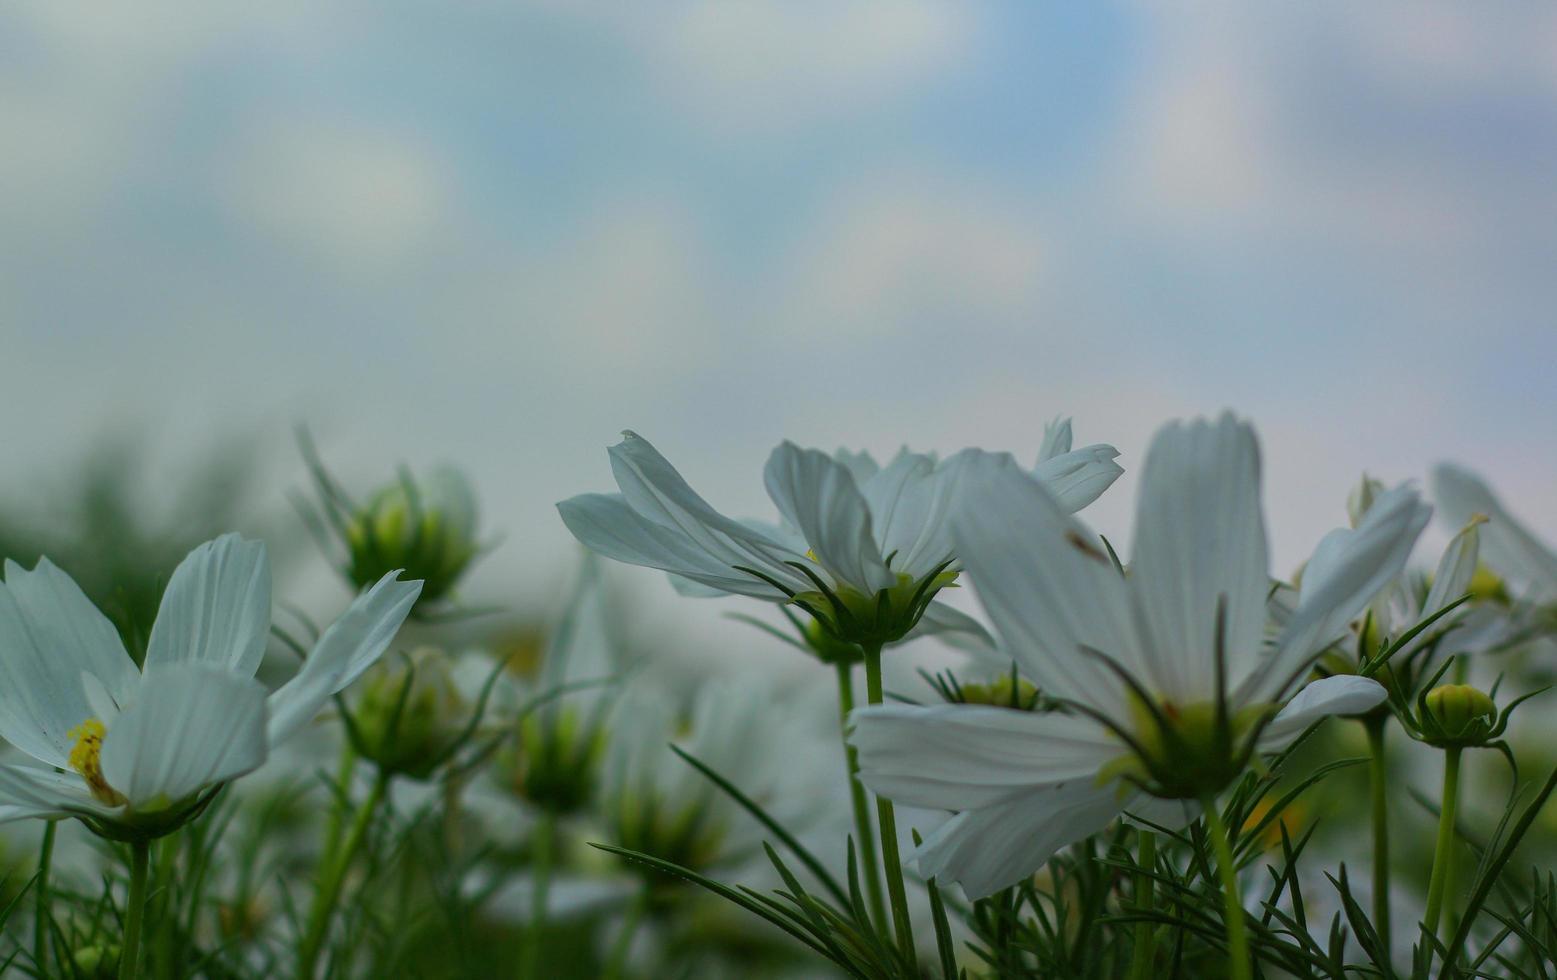 vit kosmosblomma som blommar foto